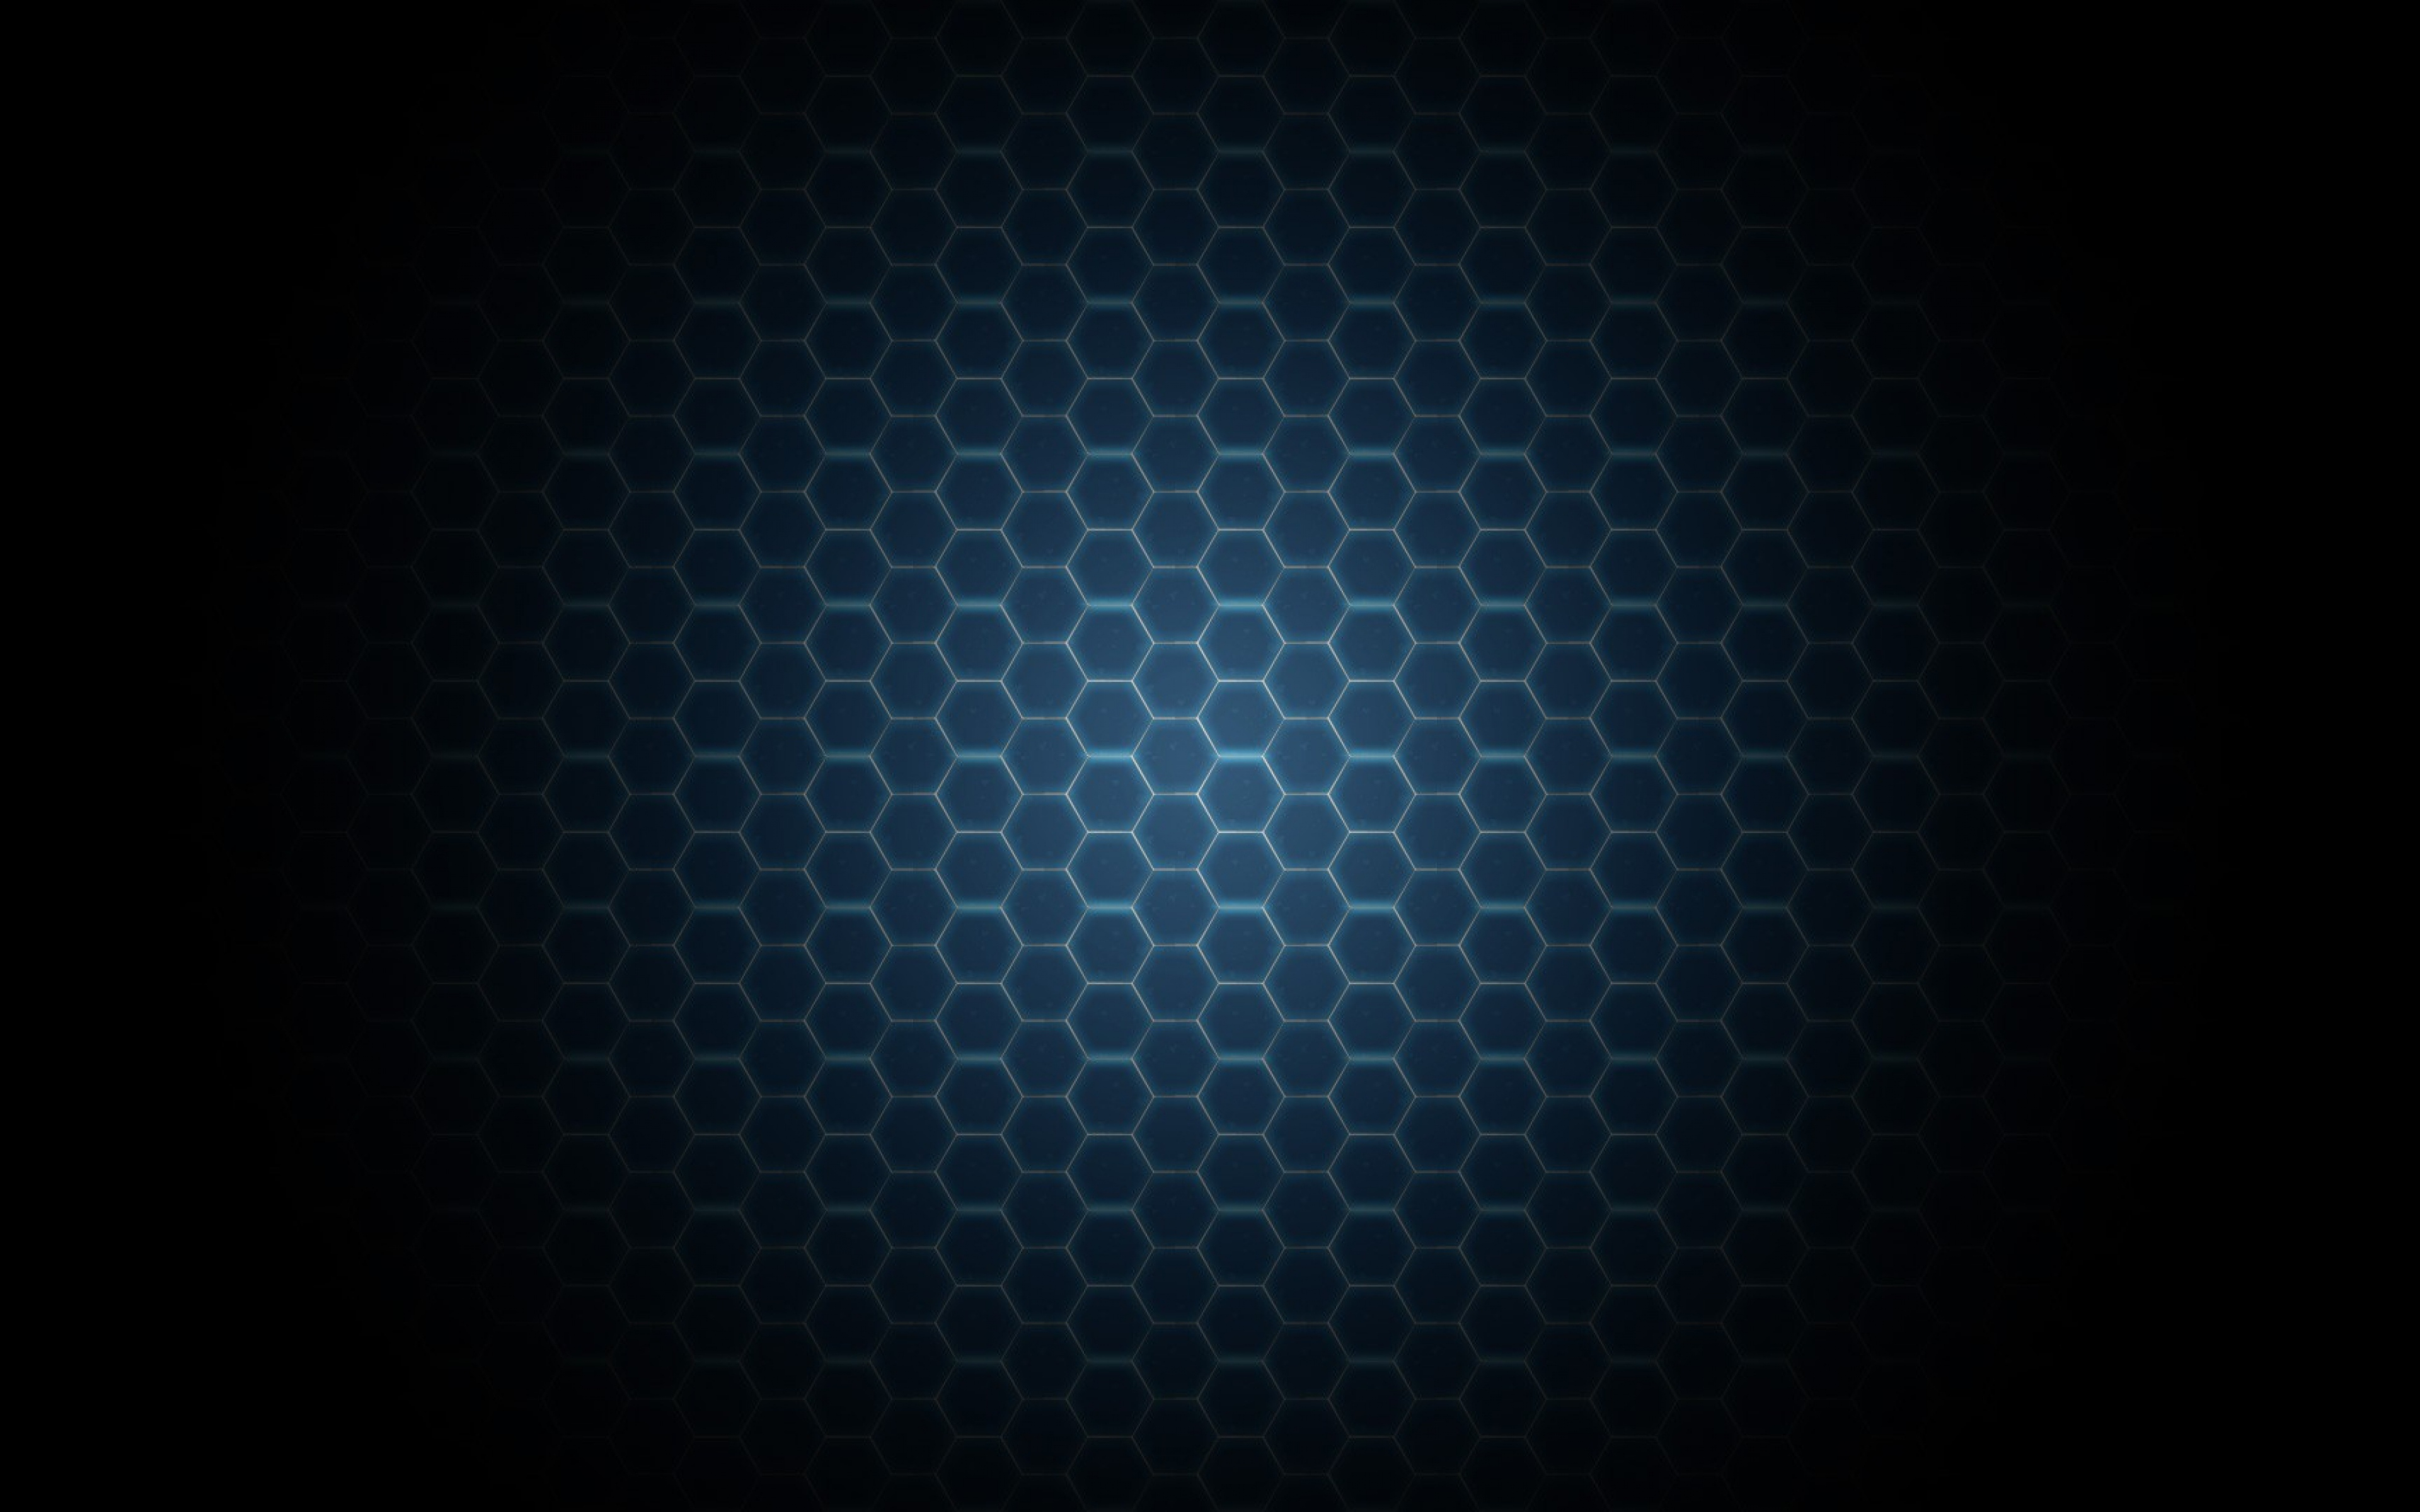 Wallpaper 3840x2400 background texture dark patterns Ultra HD 4K 3840x2400